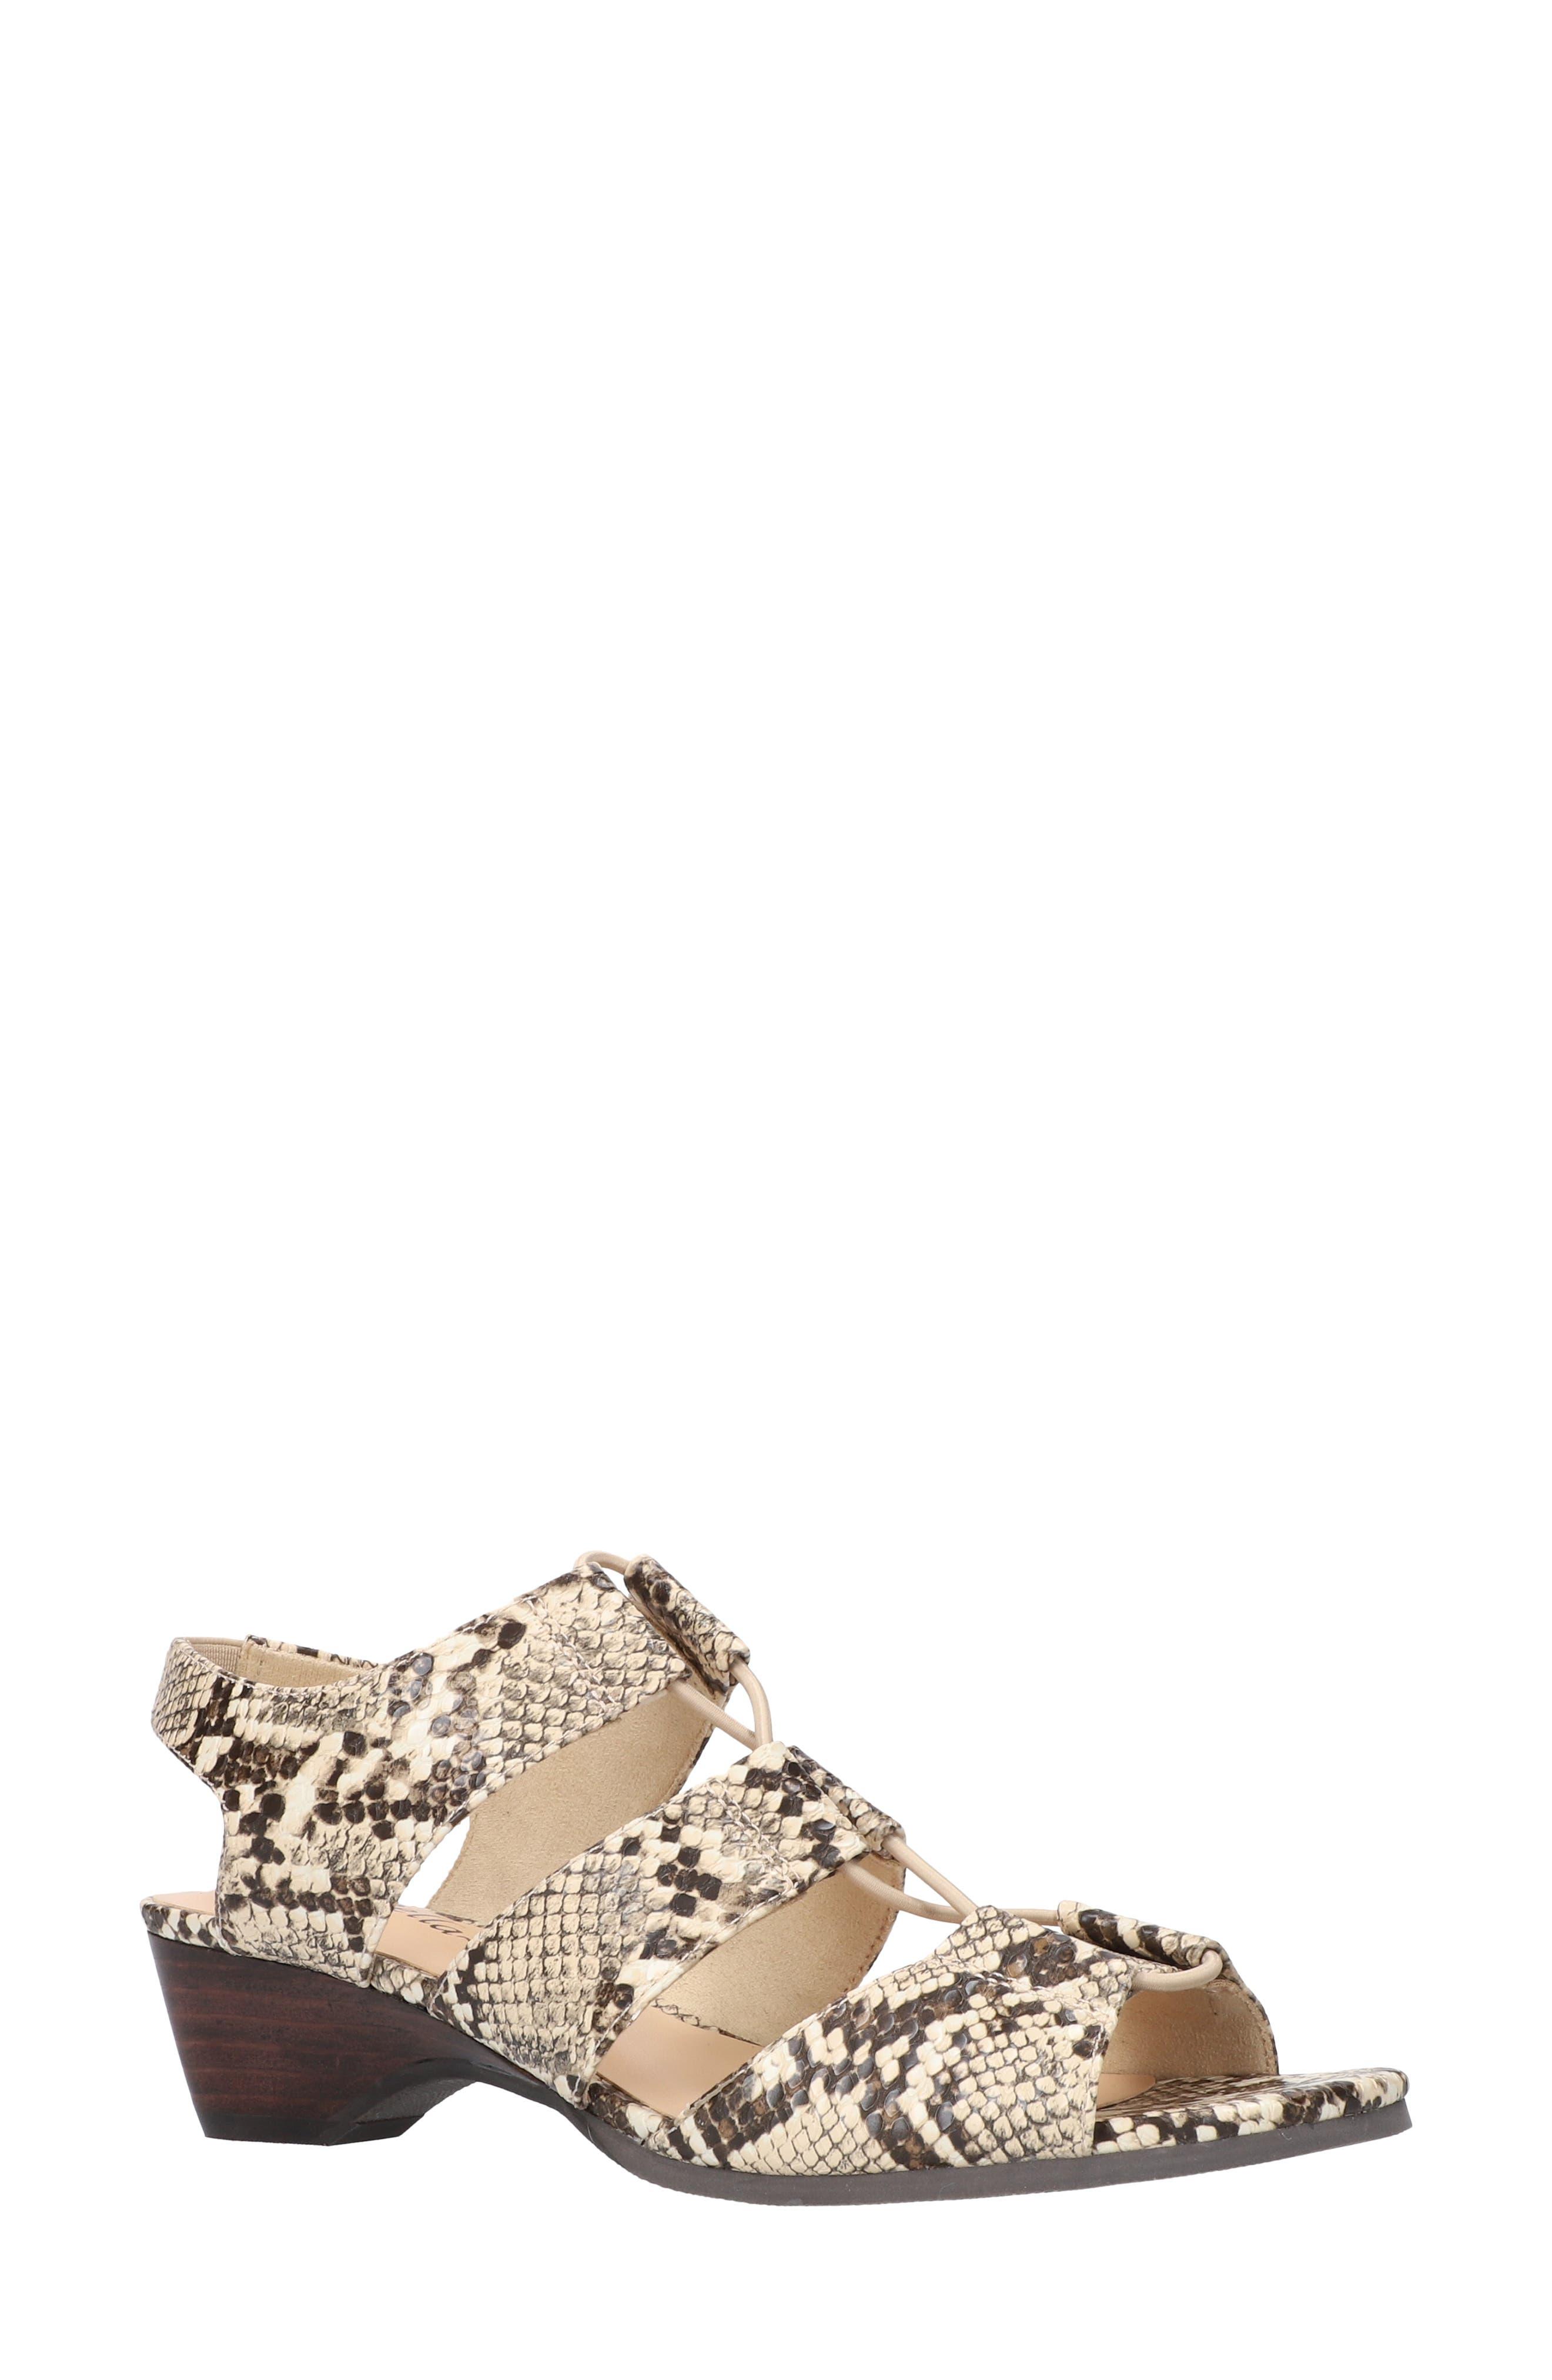 Suzette Strappy Sandal